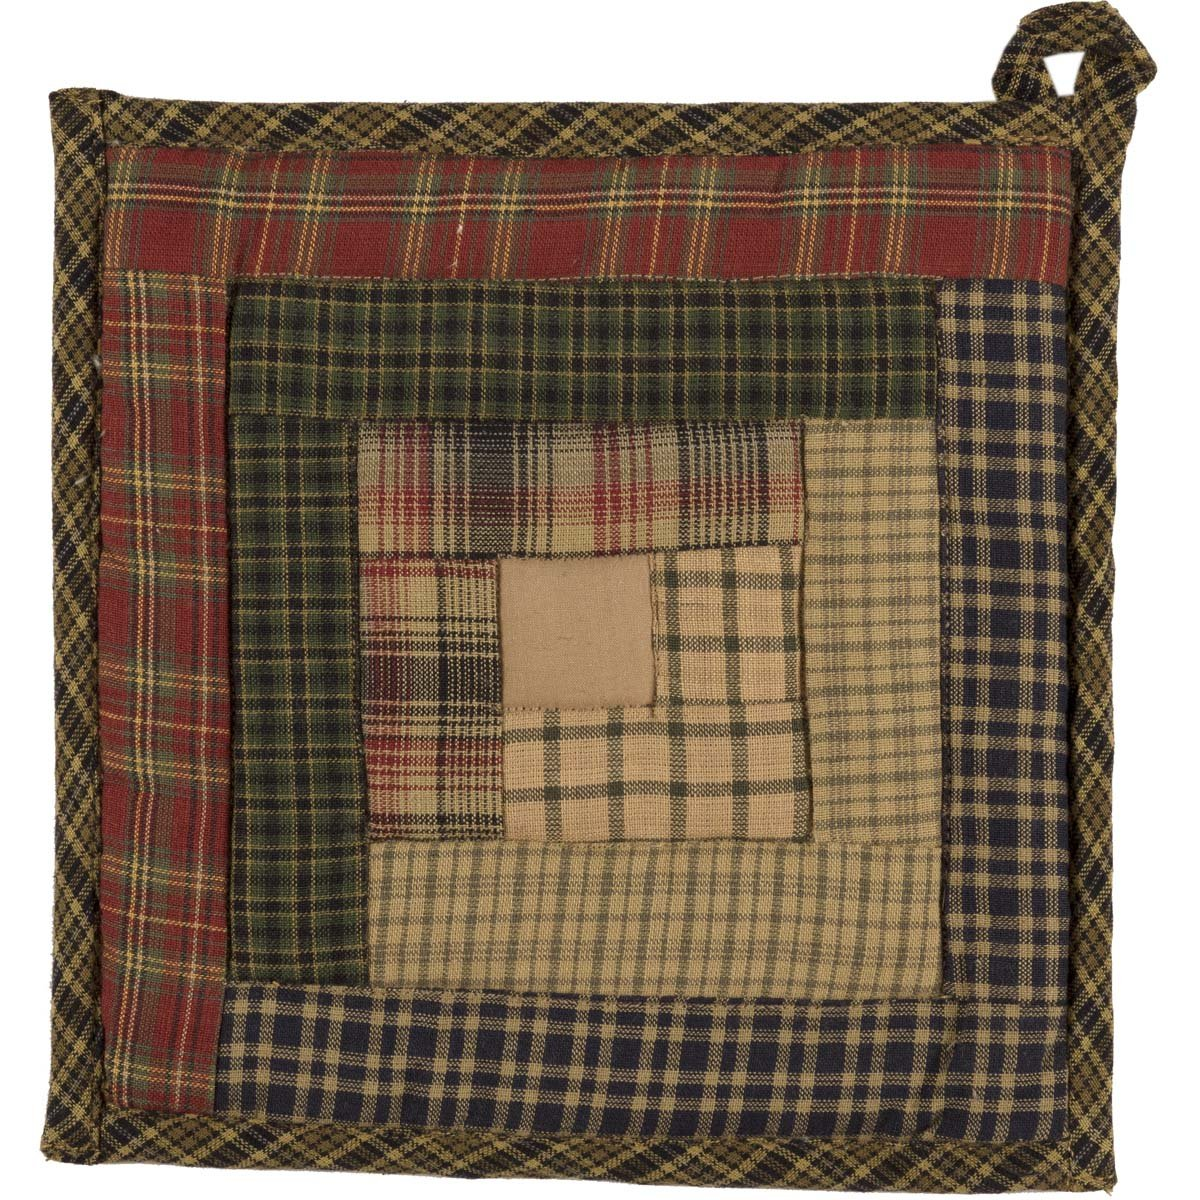 "VHC Brands Rustic & Lodge Tabletop & Kitchen - Tea Cabin Green Patchwork Pot Holder, 8"" x 8"", Moss"